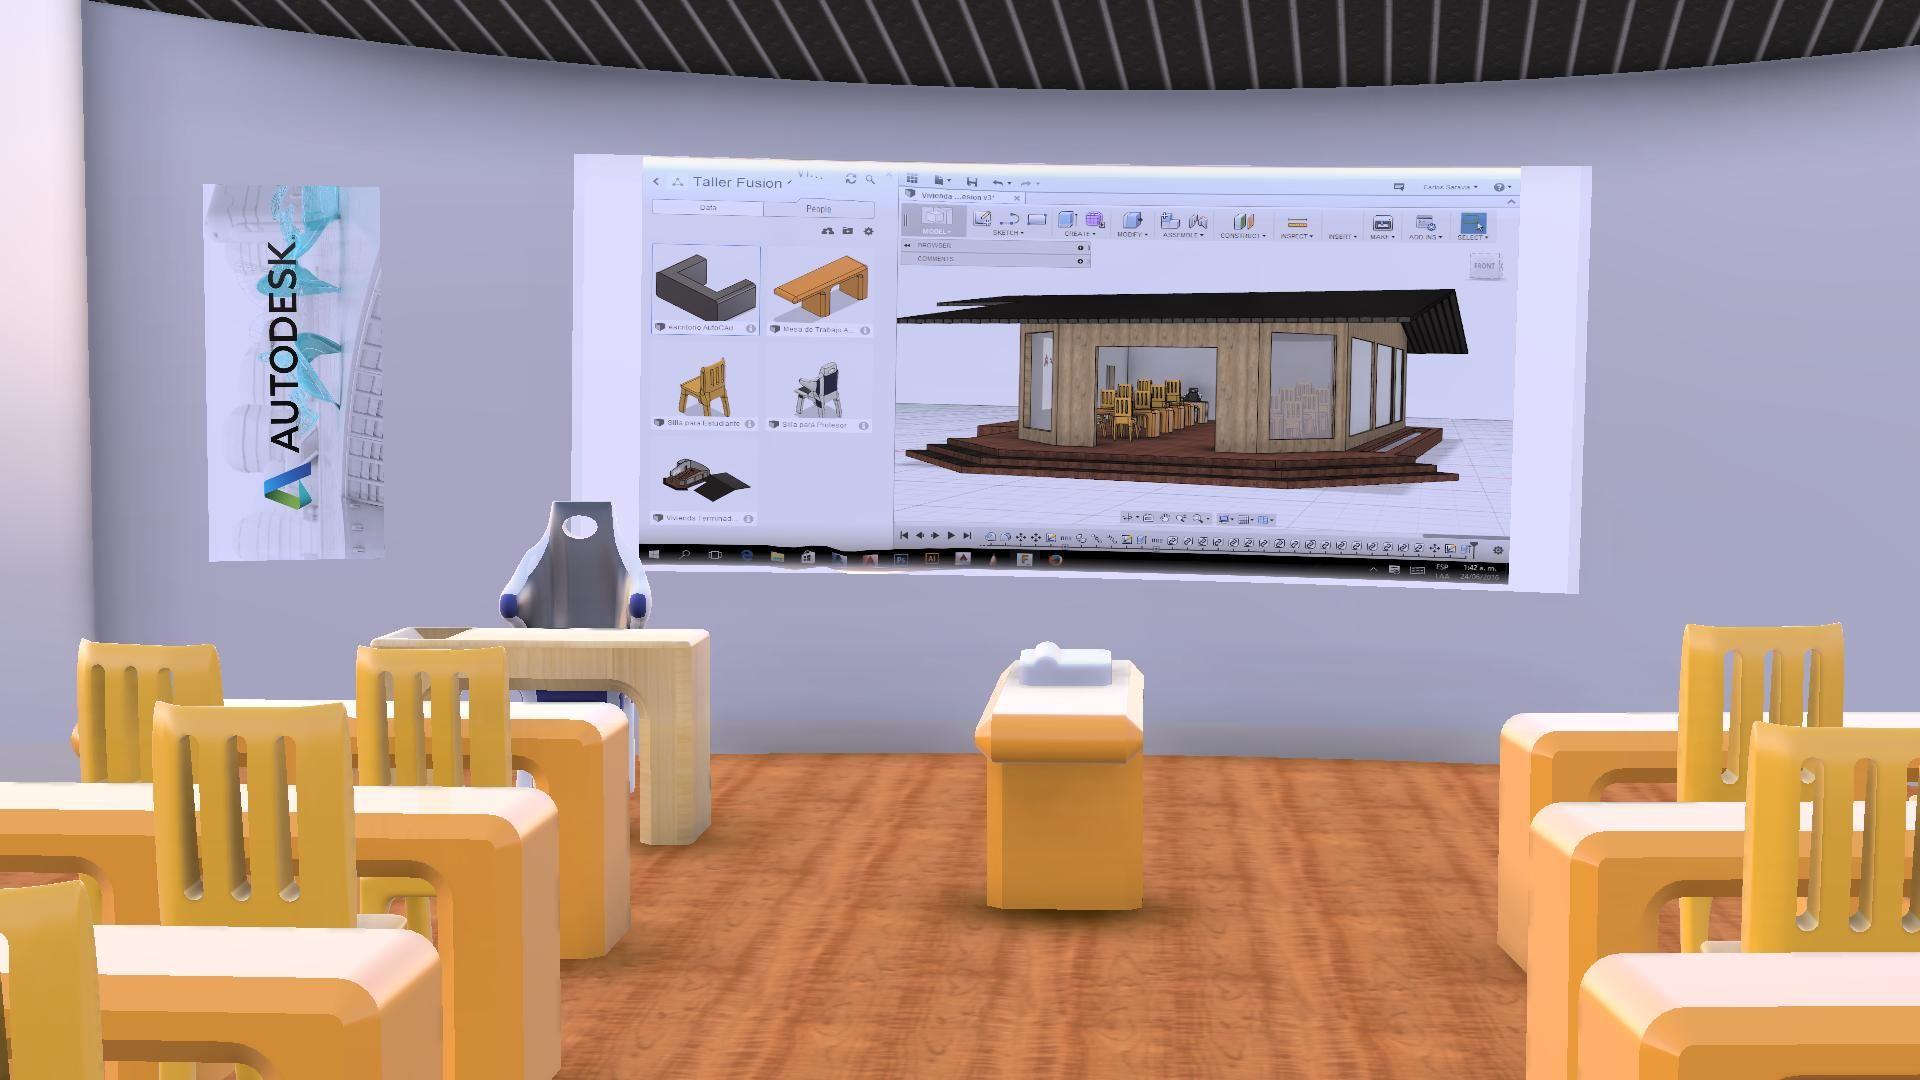 Vista-interior---vivienda-taller-fusion-360-3500-3500